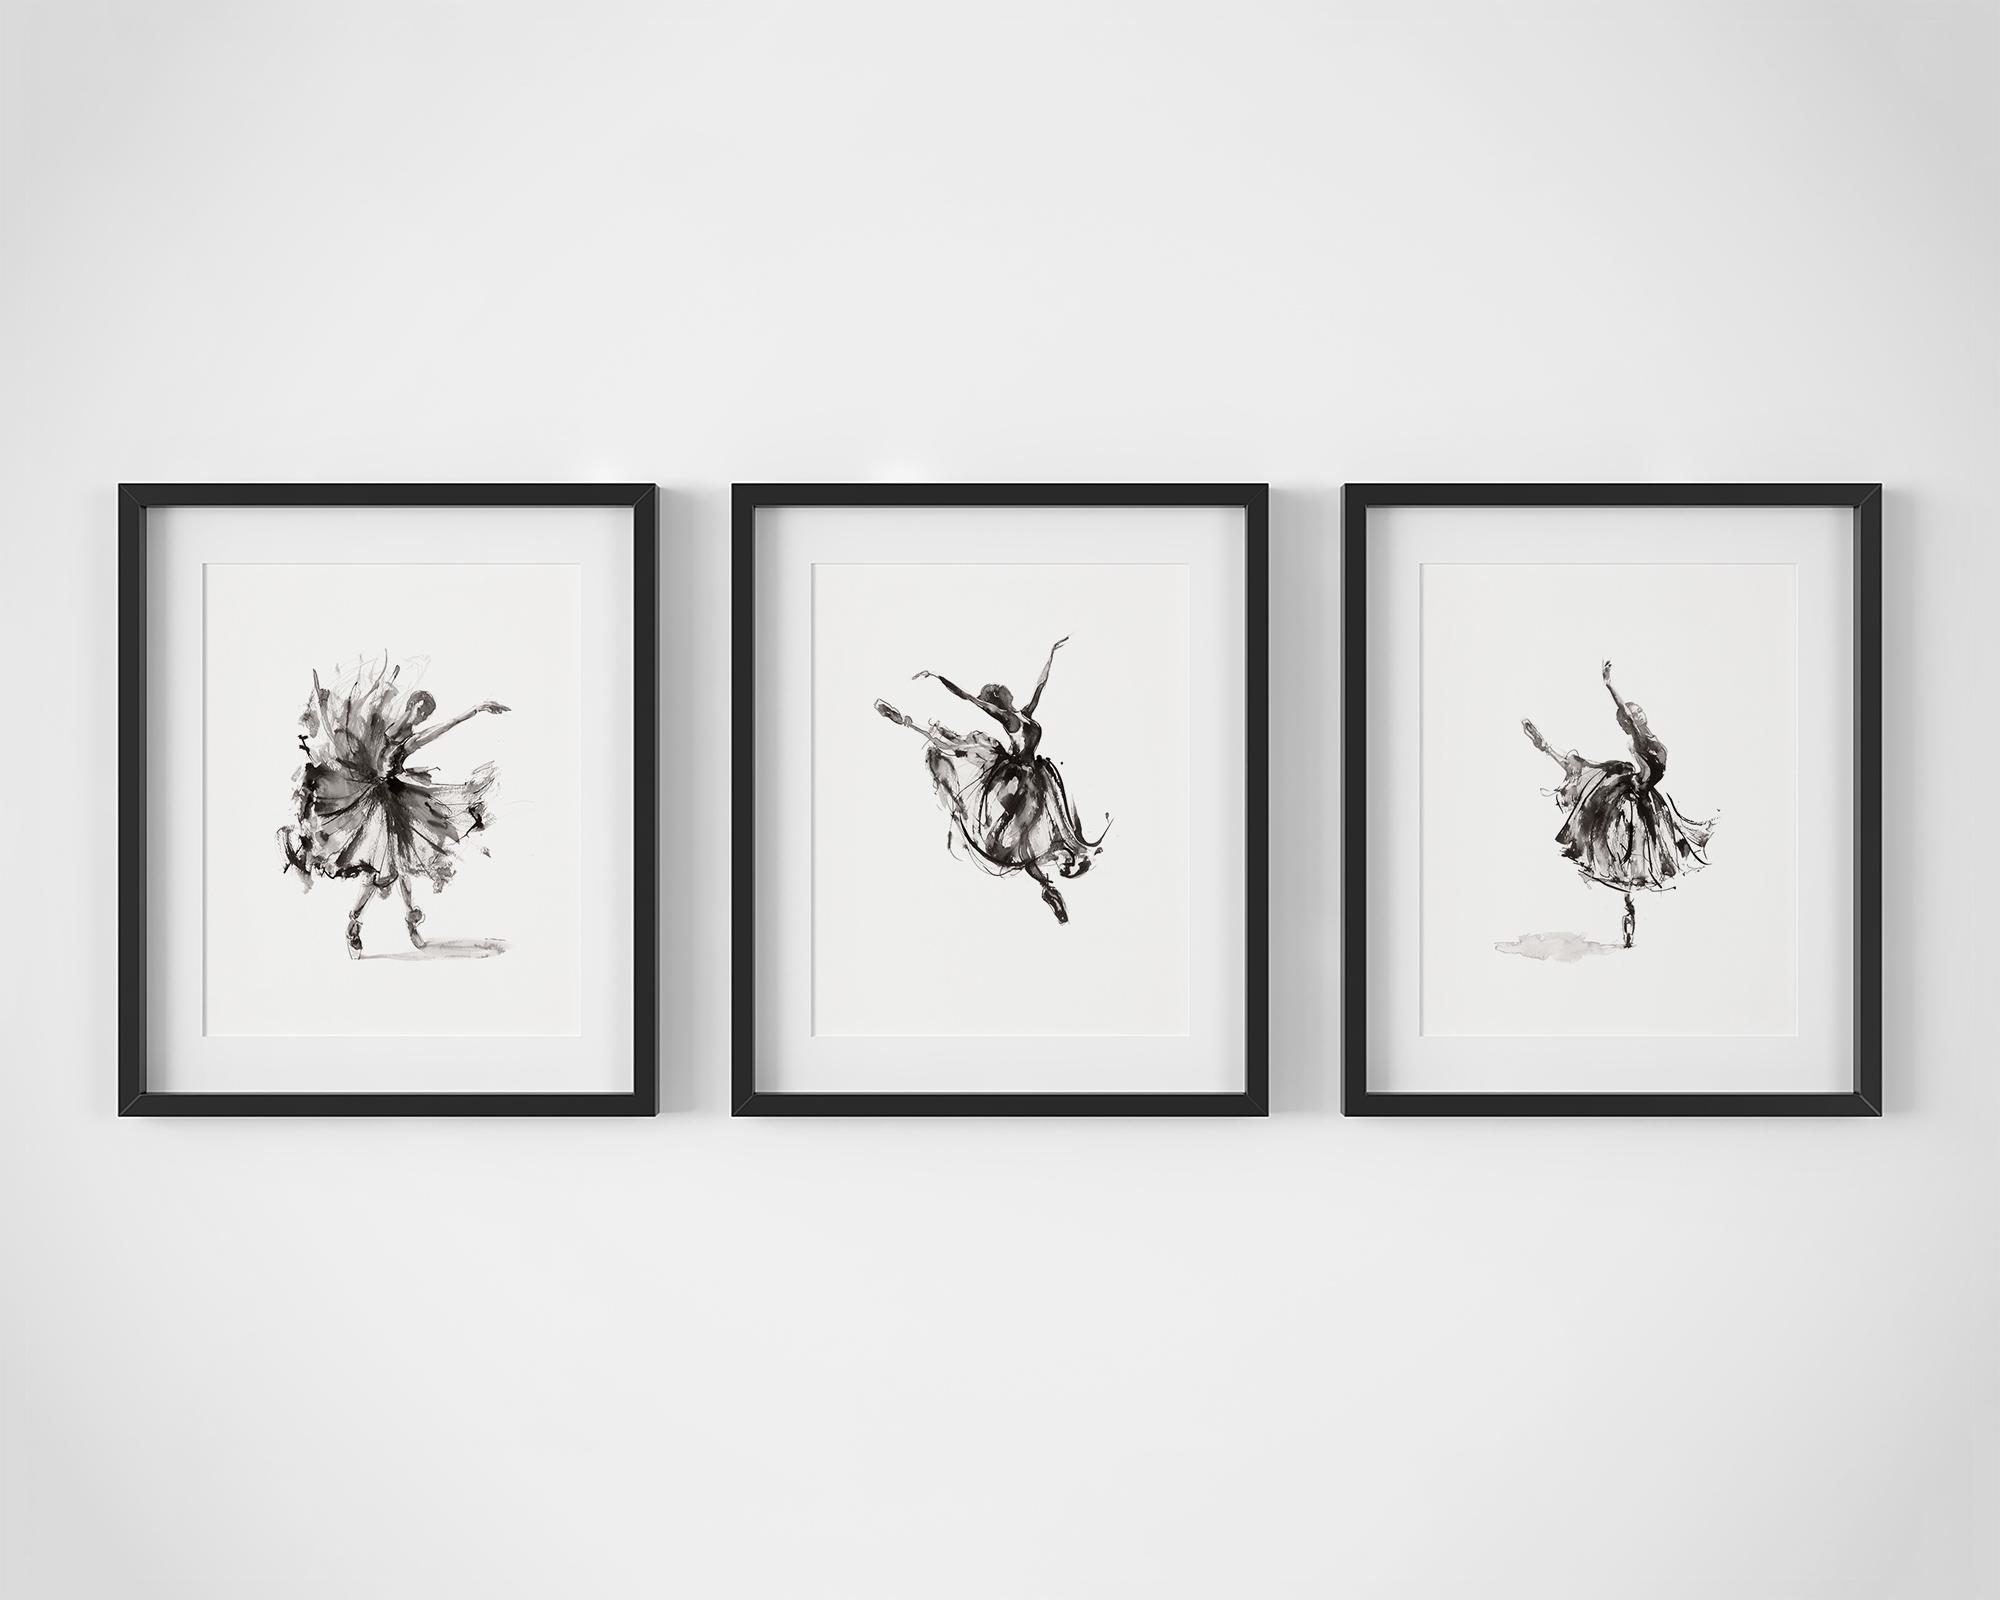 Set of 3 Ballet Dancer Fine Art Prints by Artist, Dana Trijbetz.  Original Ink Paintings made as Giclée Prints on 100% Cotton Paper.  Set Includes 'Release', 'In Flight' and 'Symphony'.jpg